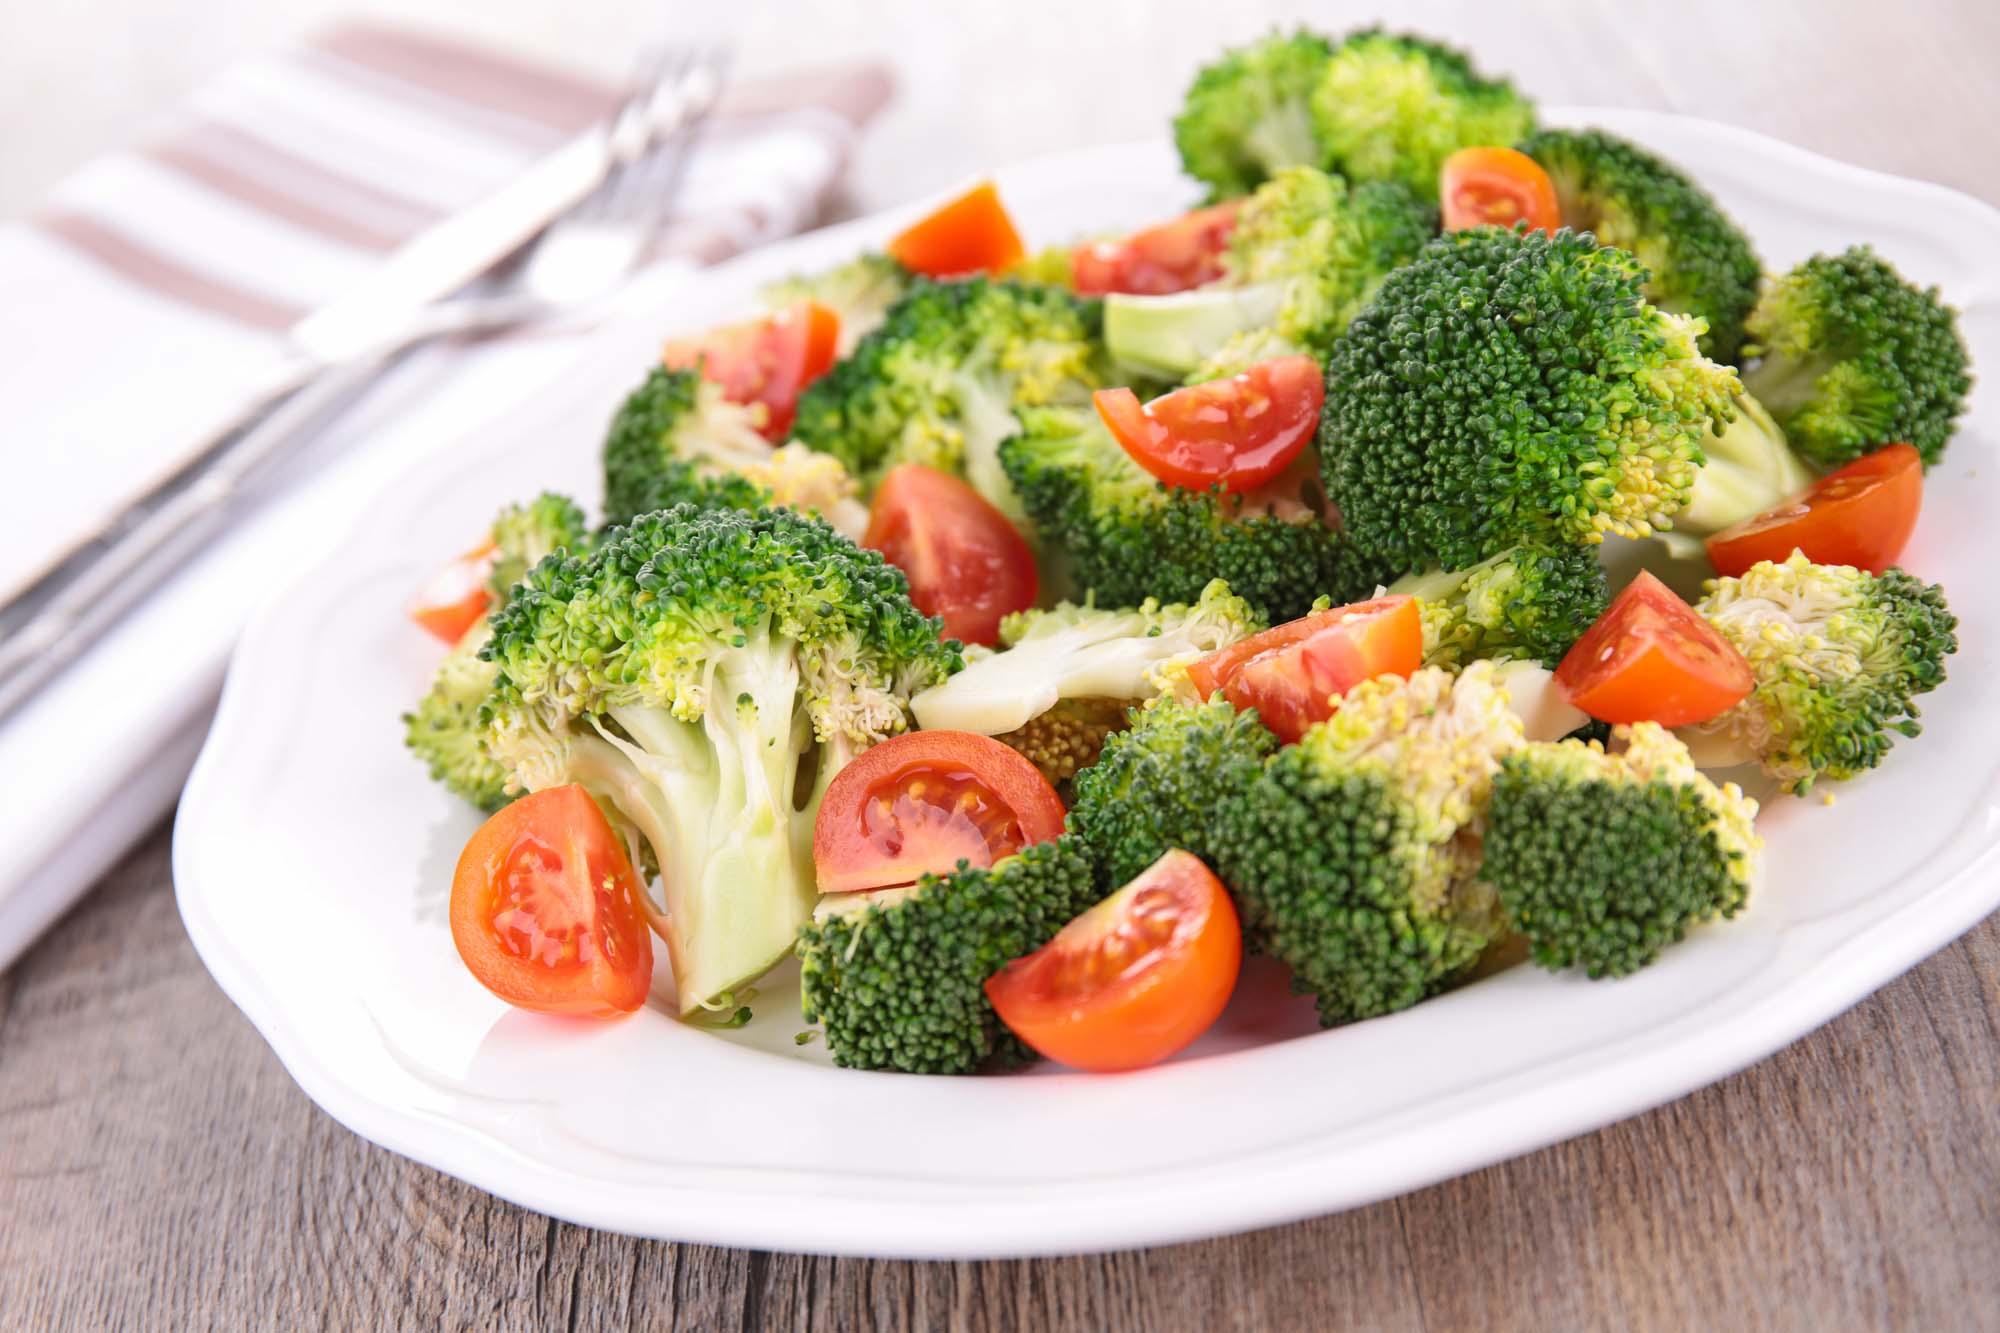 Broccolisalat med cherrytomater